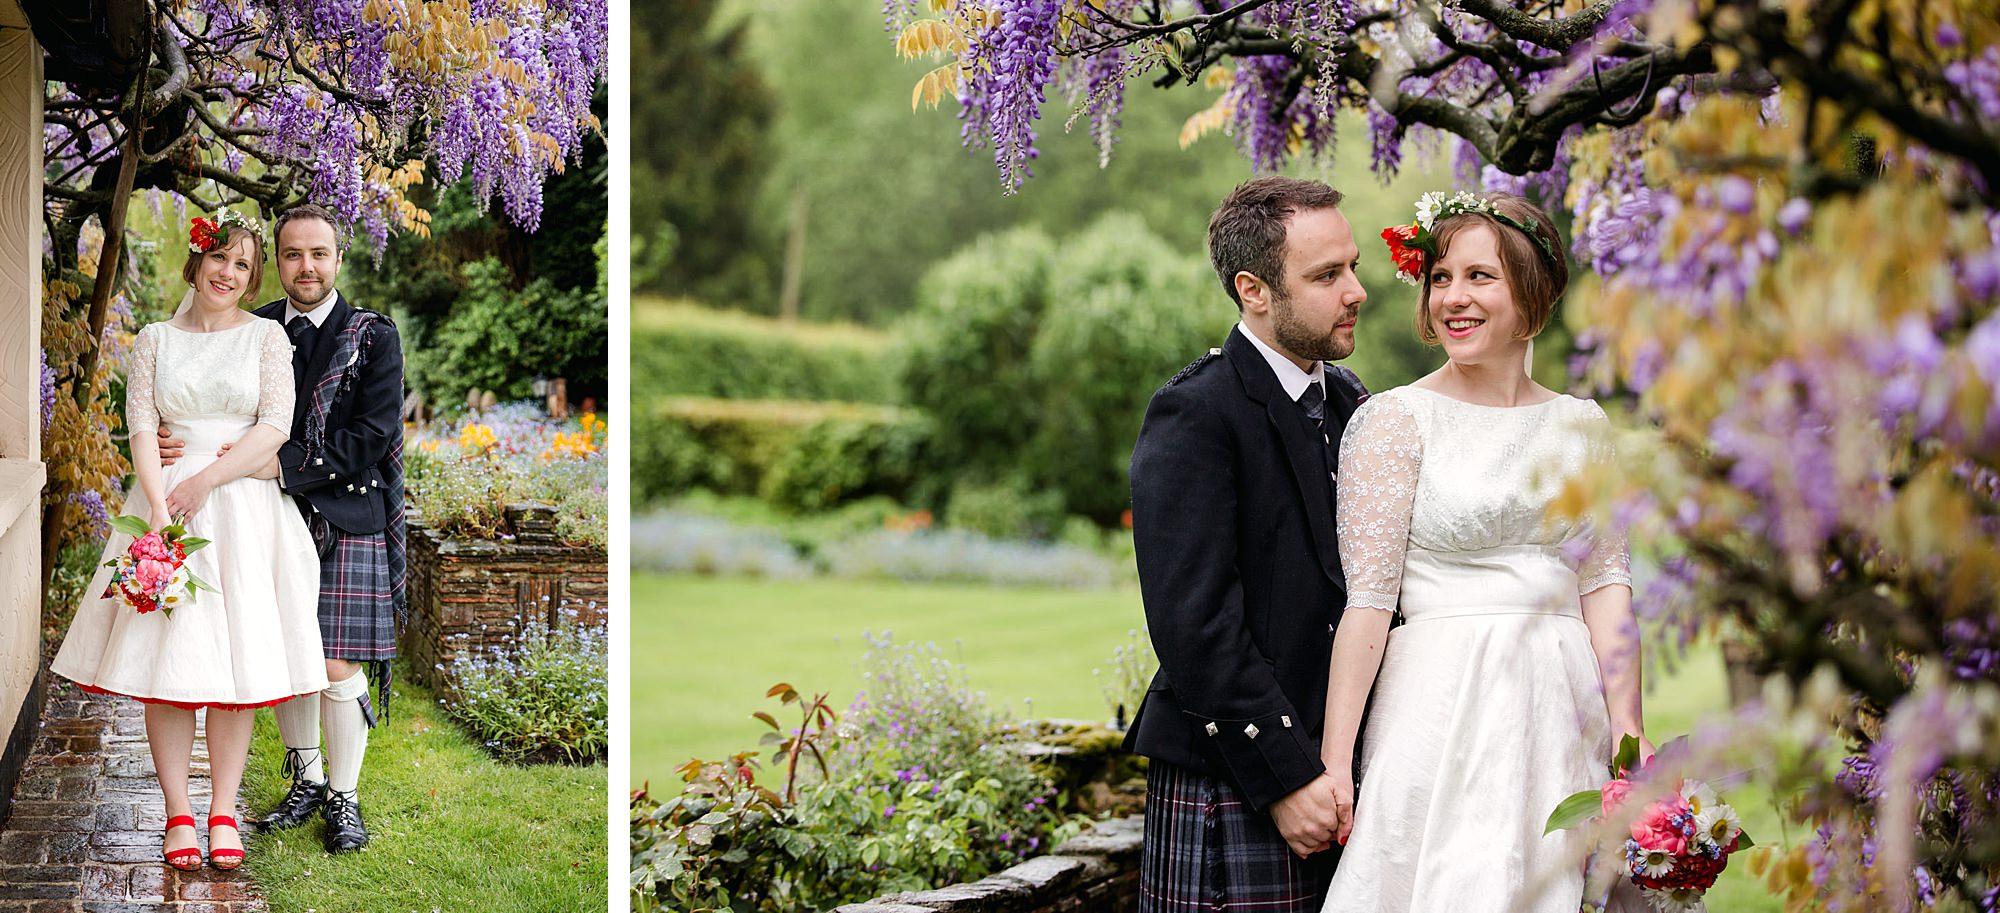 Fun DIY wedding bride and groom by wisteria flowers